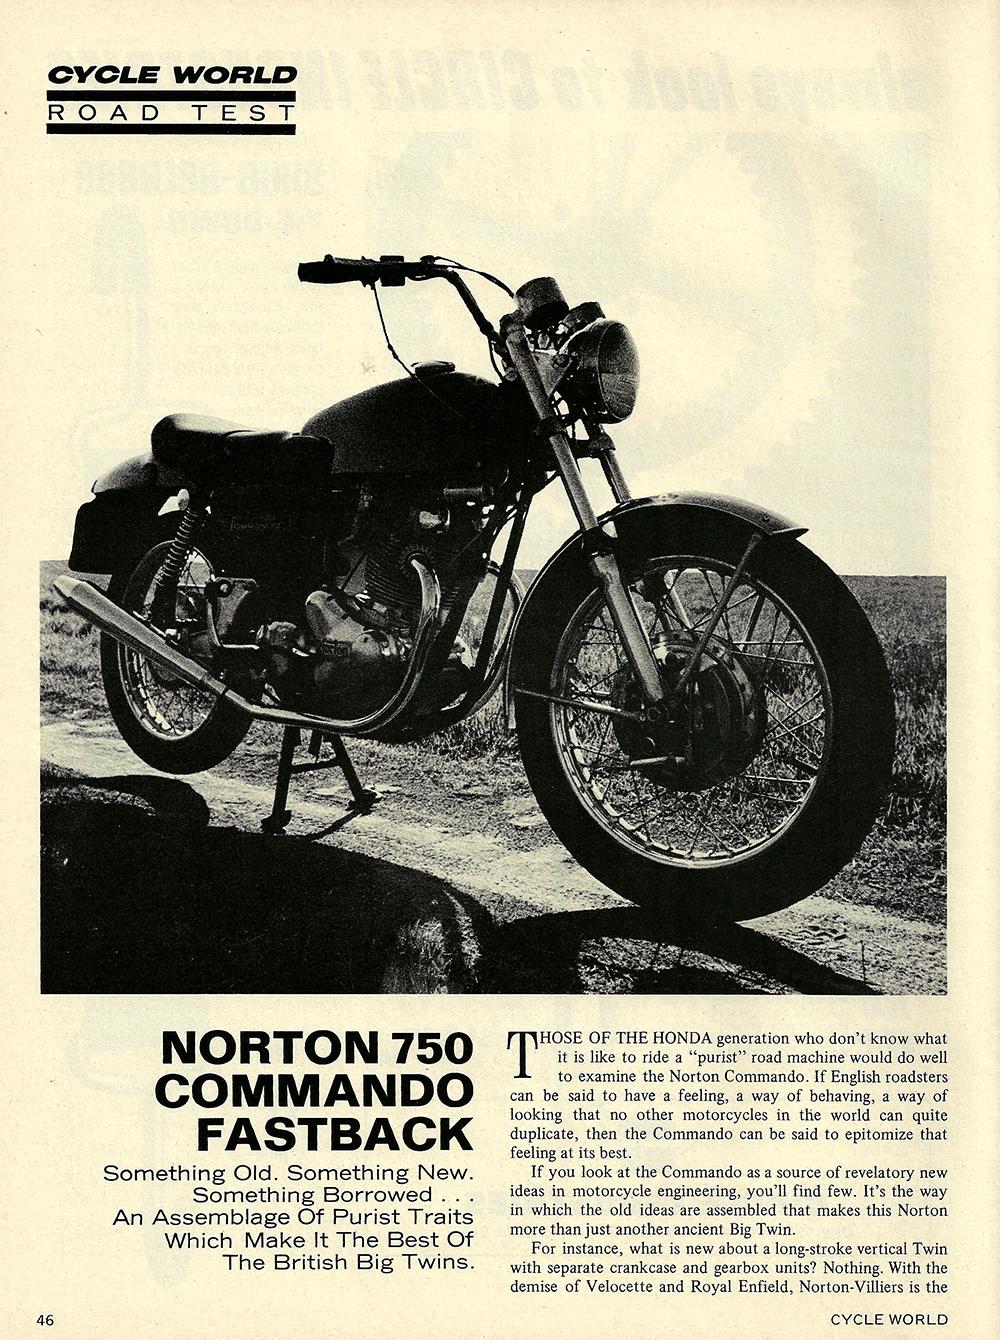 1971 Norton 750 Commando Fastback road test 01.jpg